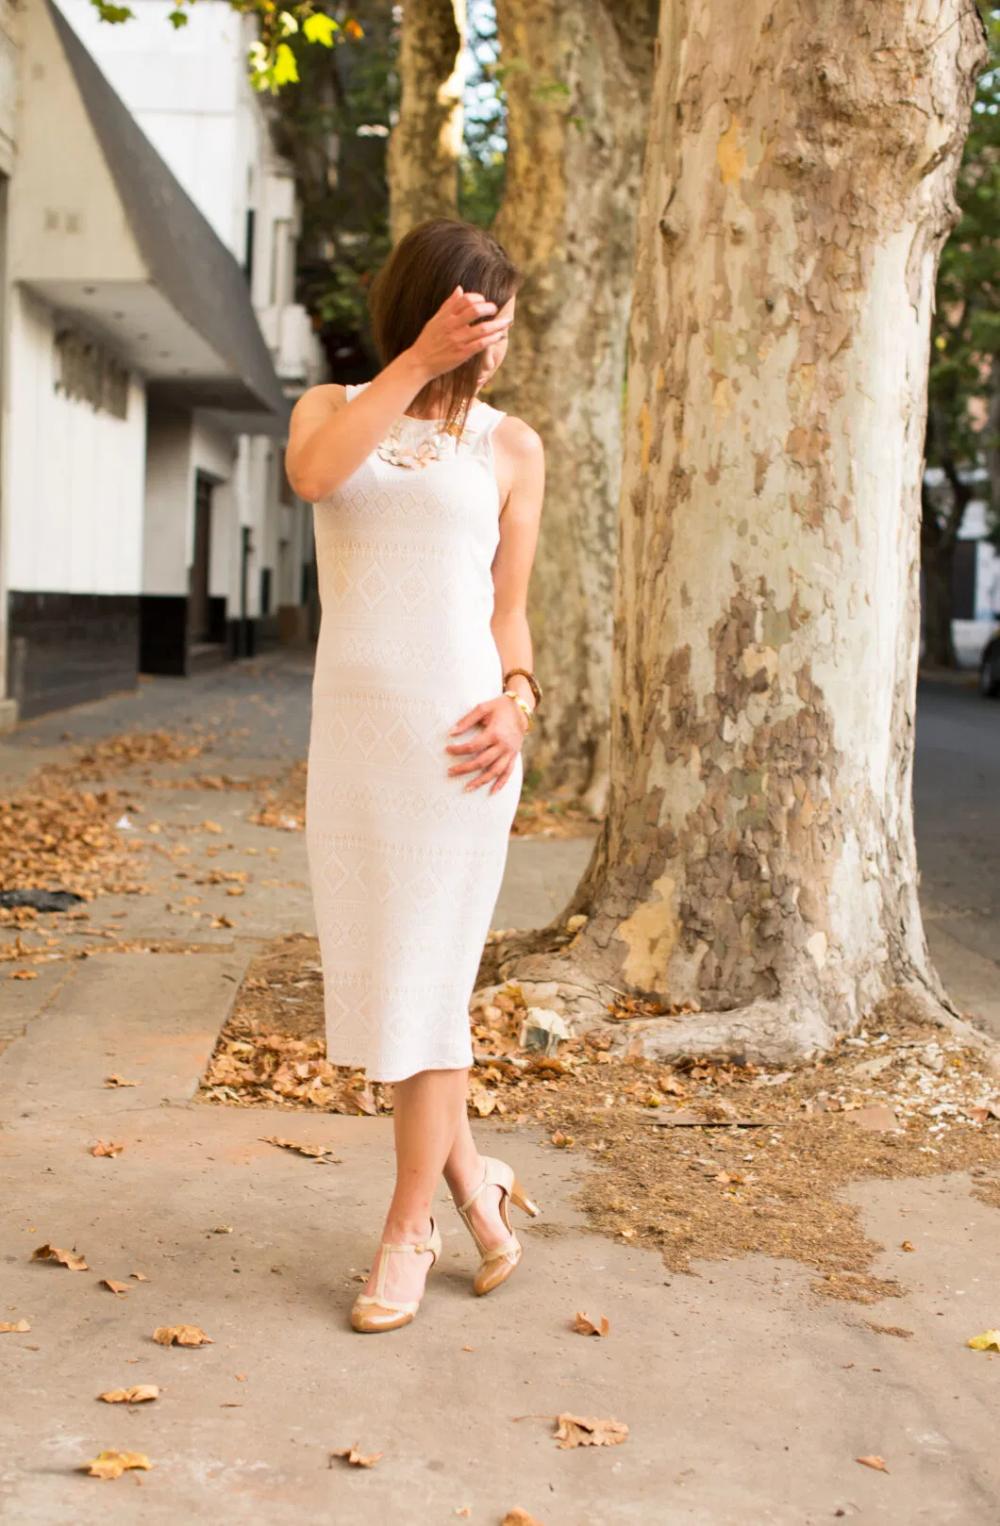 Summer Ready With A Sheath Dress Sheath Dress Pink Bodycon Dresses T Strap Heels [ 1526 x 1000 Pixel ]